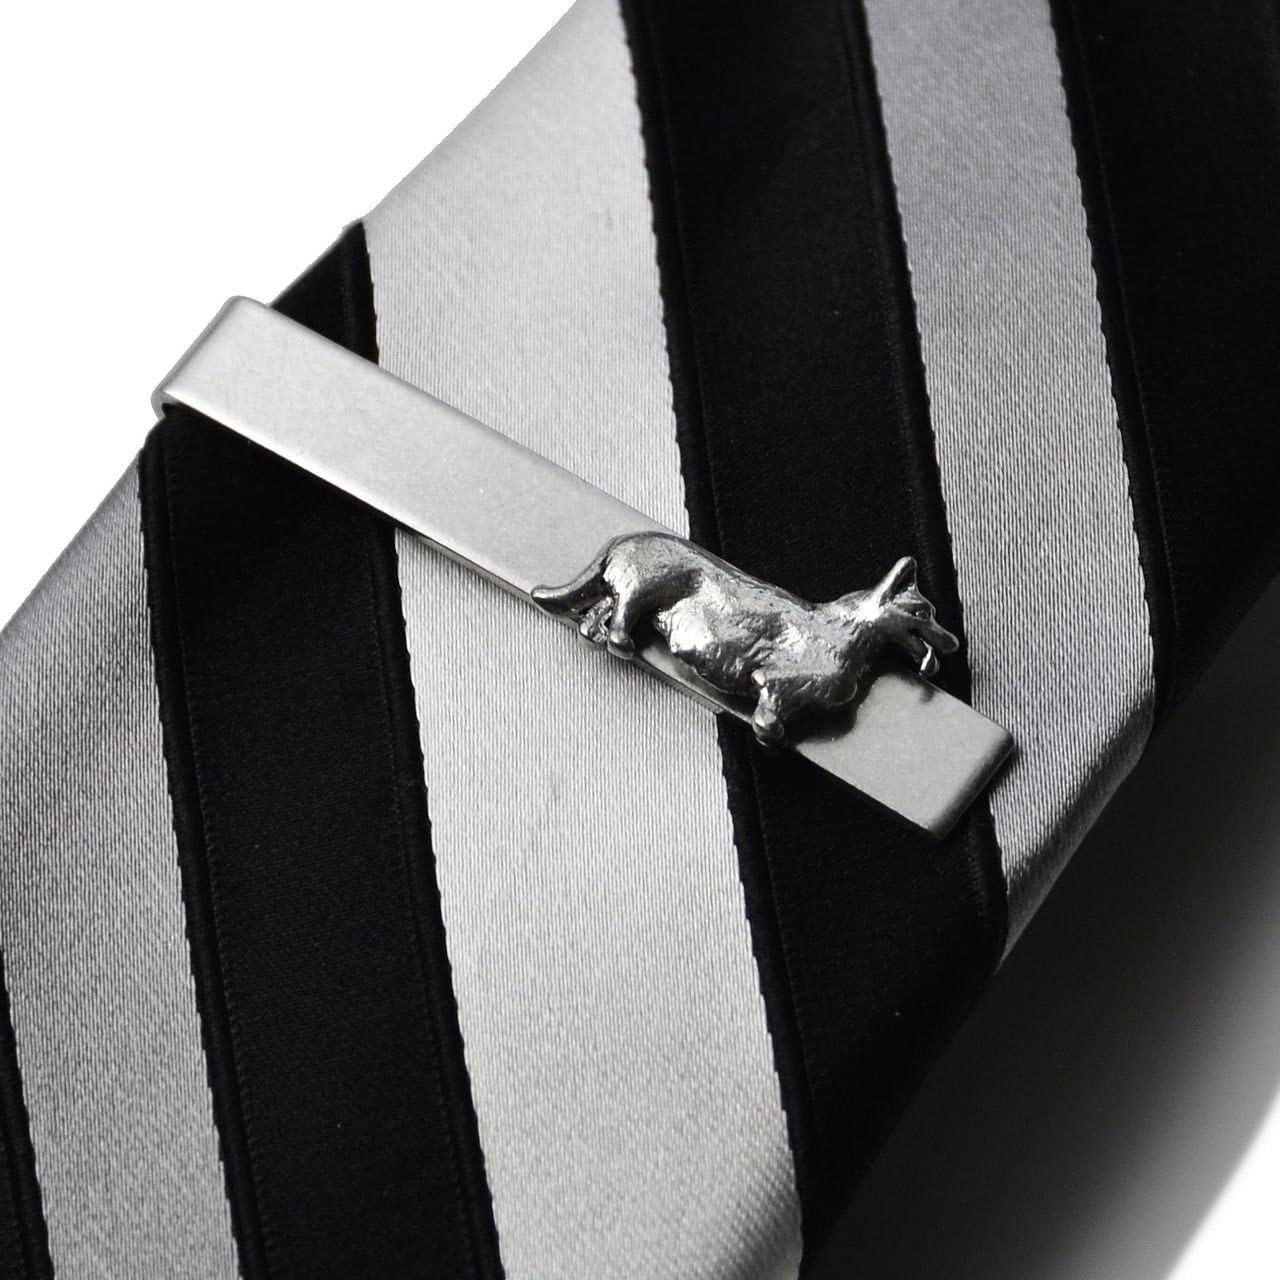 Quality Handcrafts Guaranteed Fleur de Lis Tie Clip